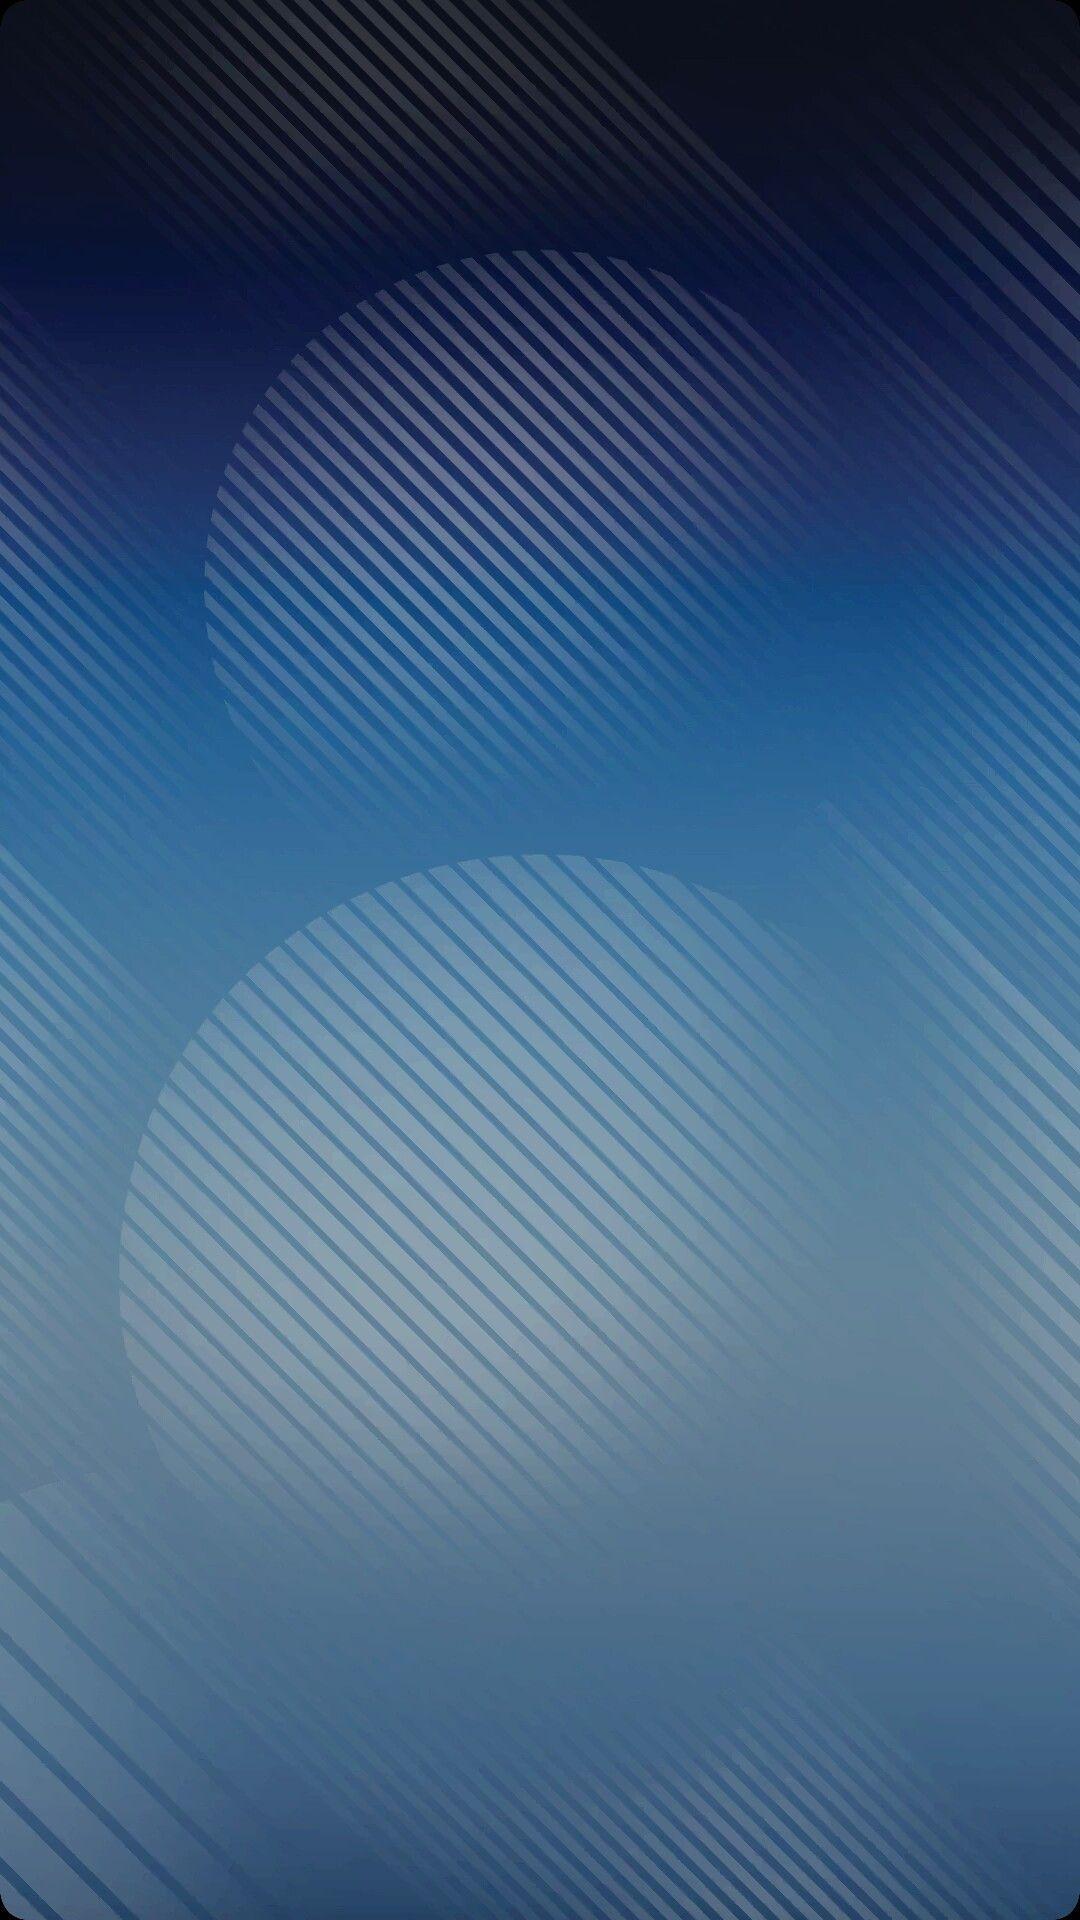 Samsung J4 Wallpapers Top Free Samsung J4 Backgrounds Wallpaperaccess